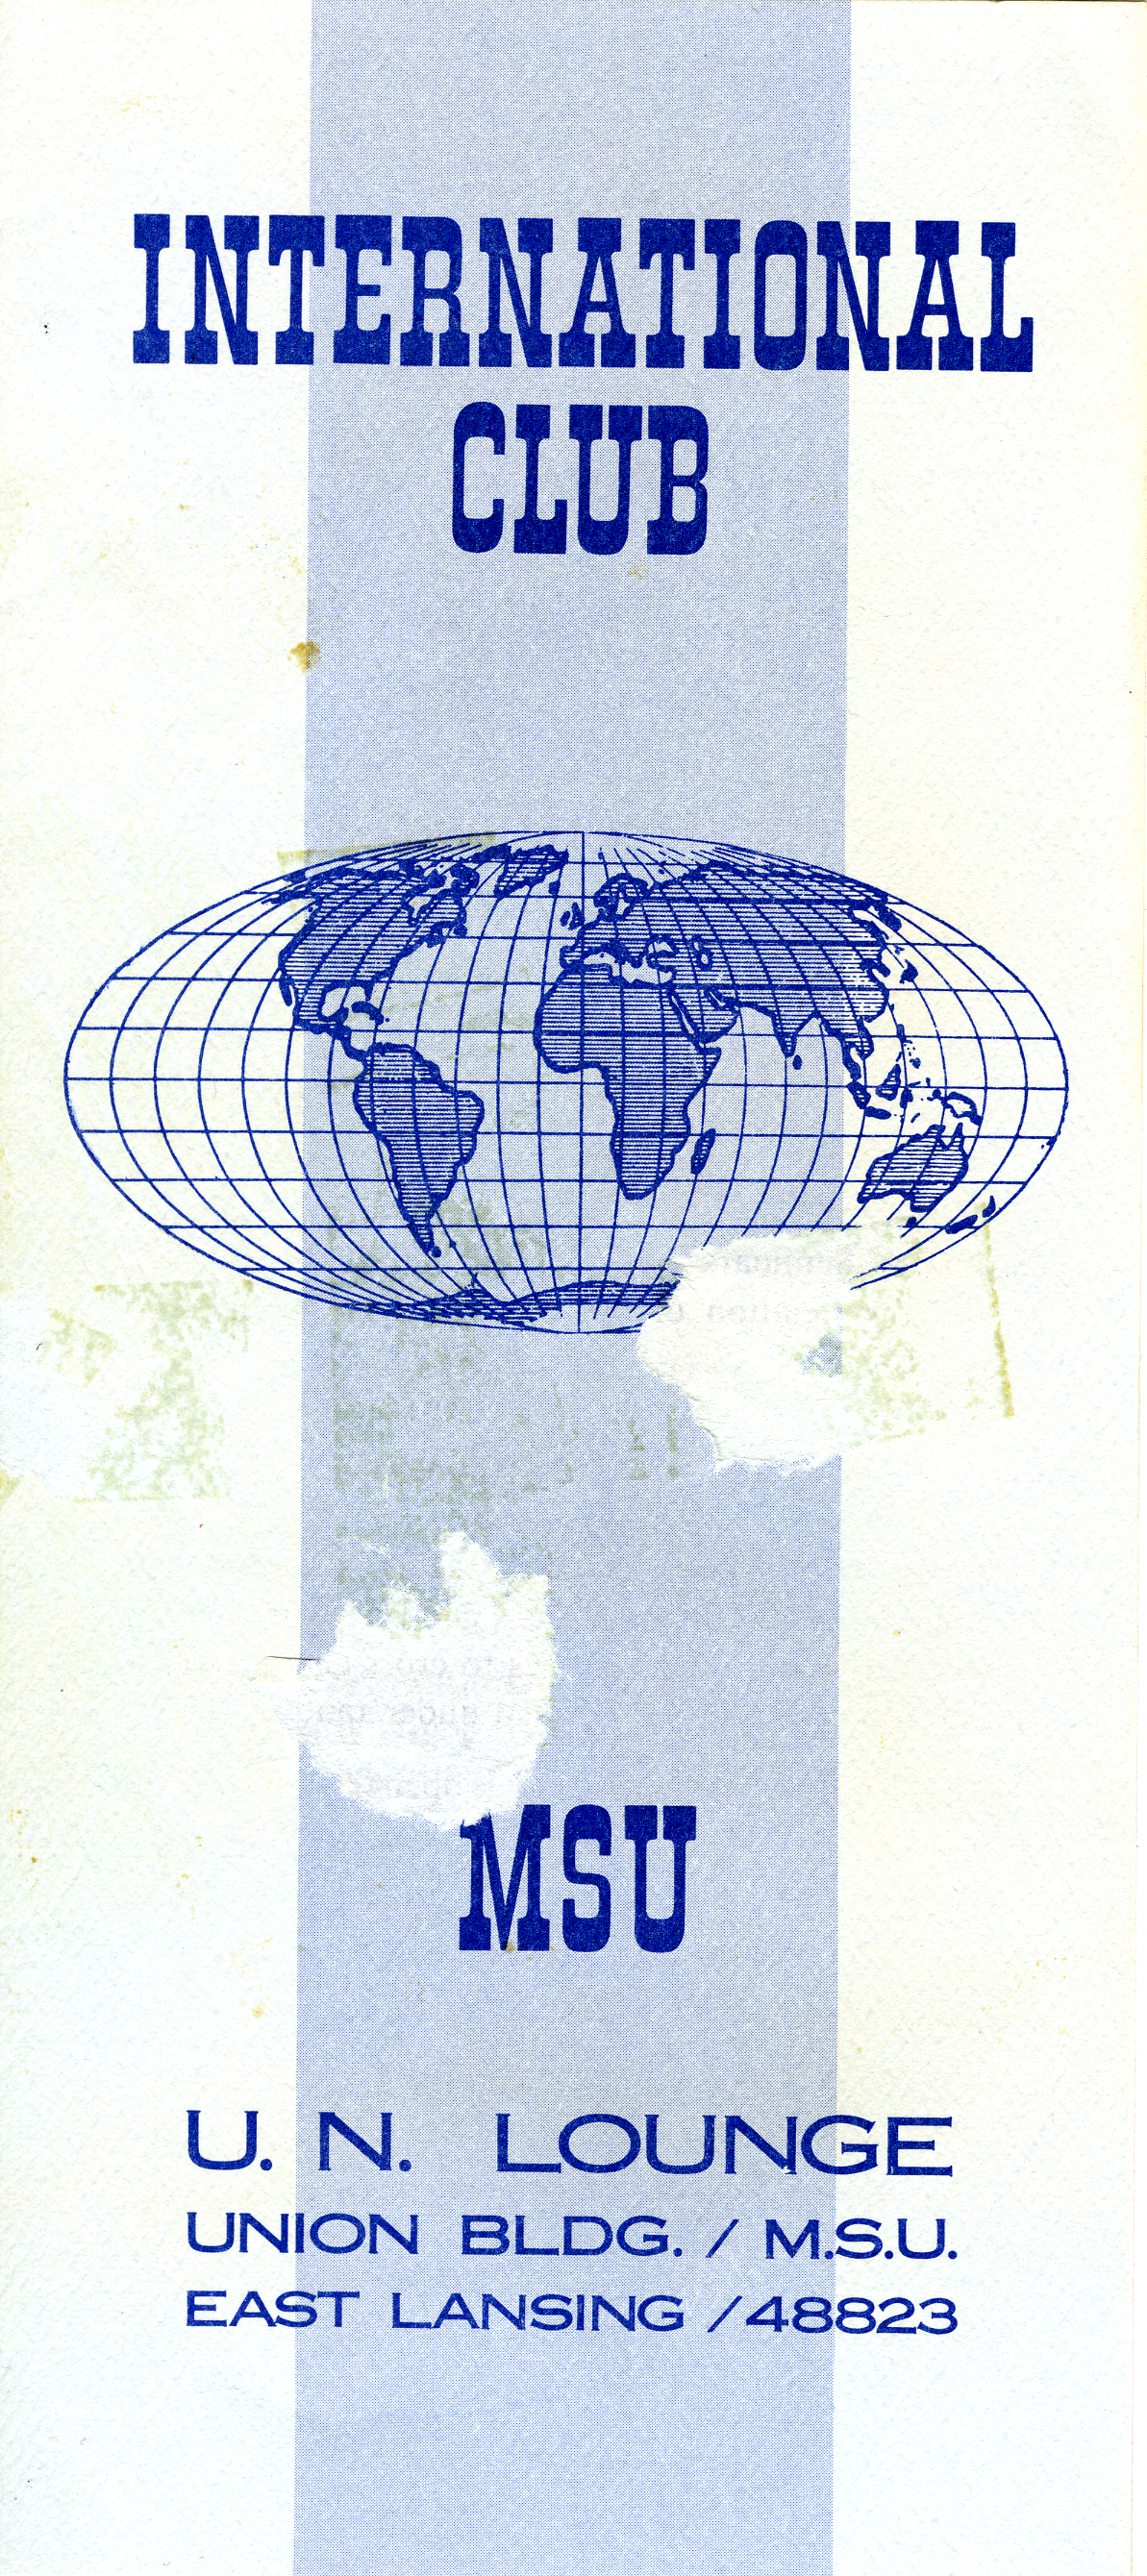 Photograph of MSU International Club Pamphlet